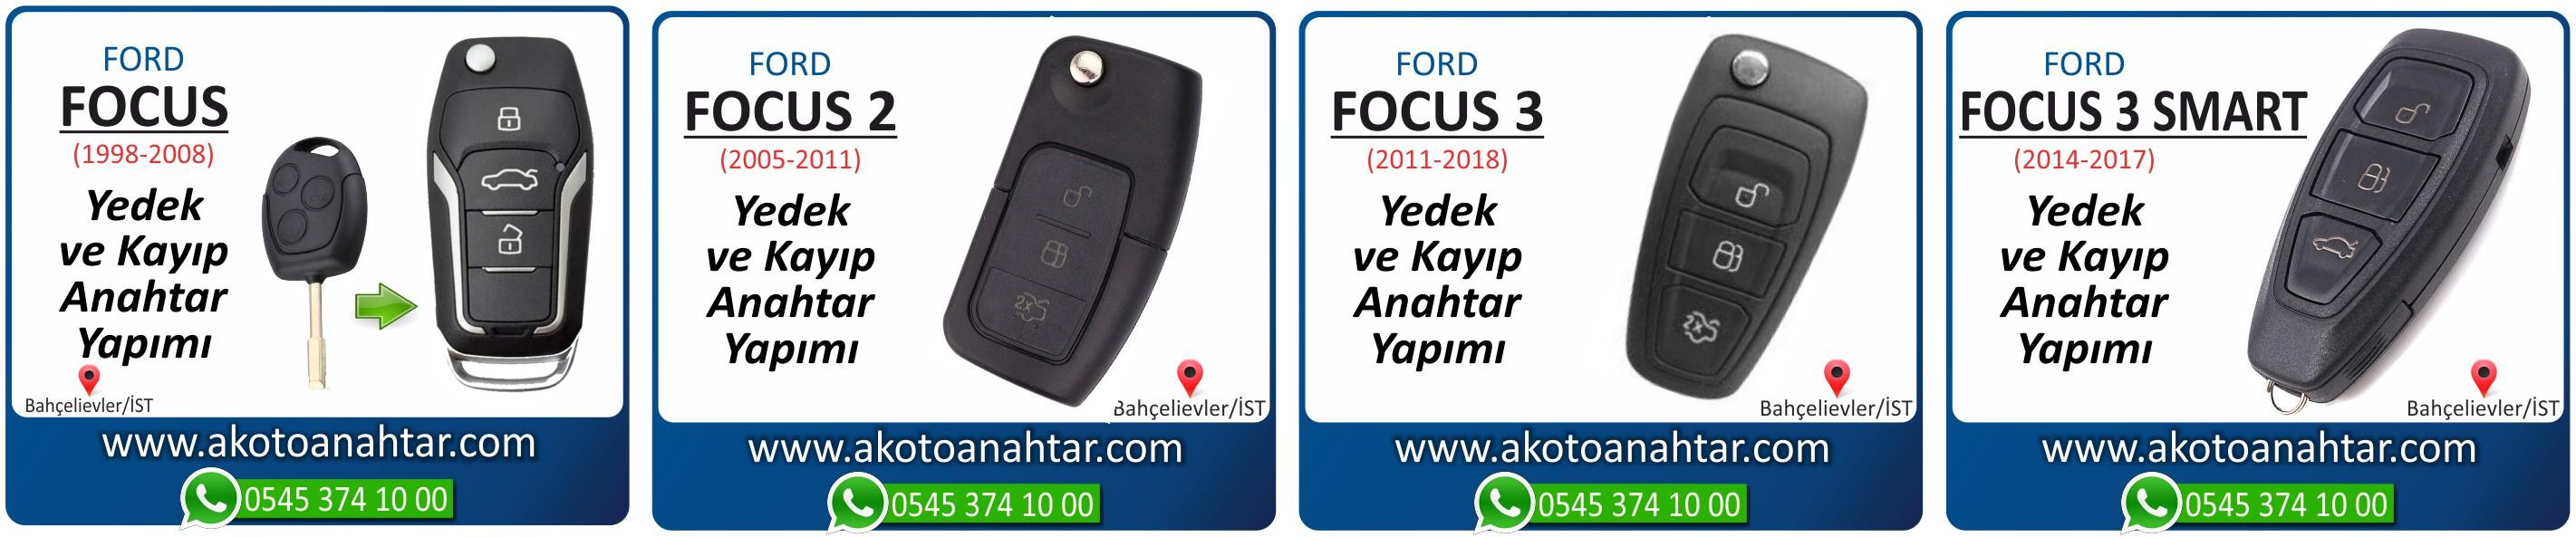 focus anahtari key - Ford Focus Anahtarı | Yedek ve Kayıp Anahtar Yapımı